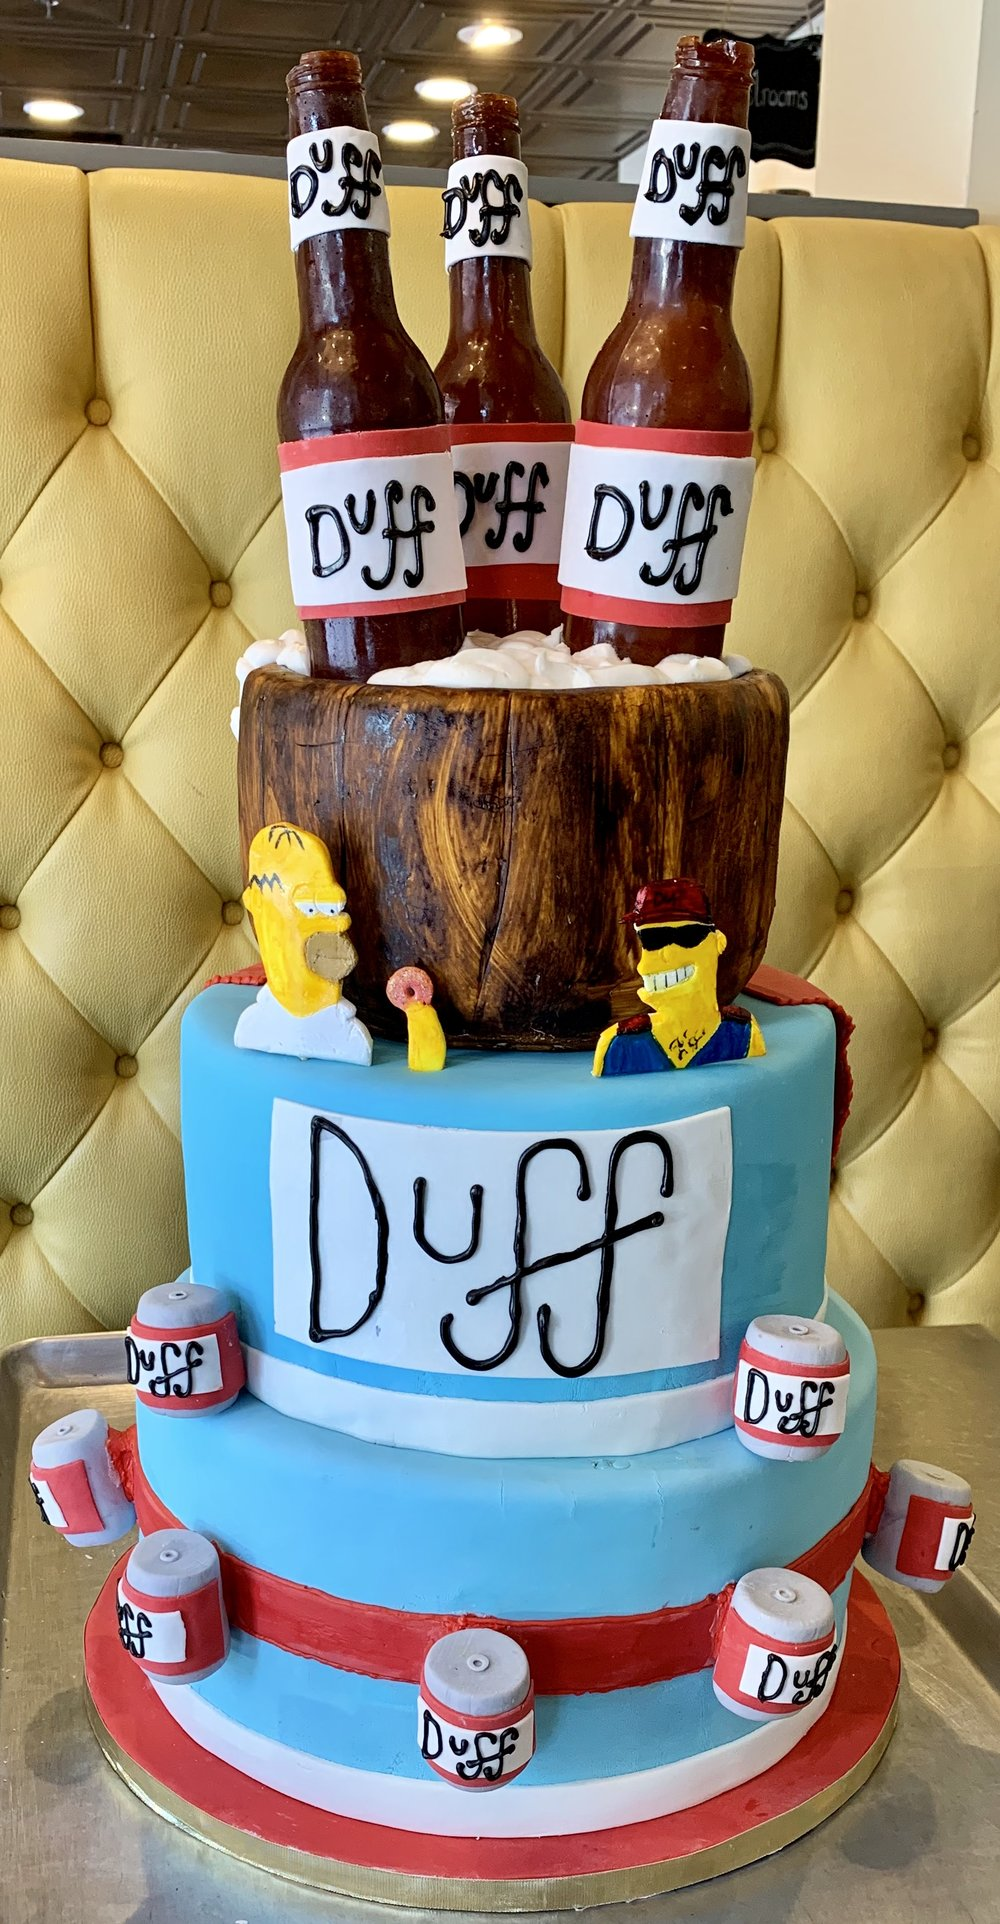 Duff Beer Cake